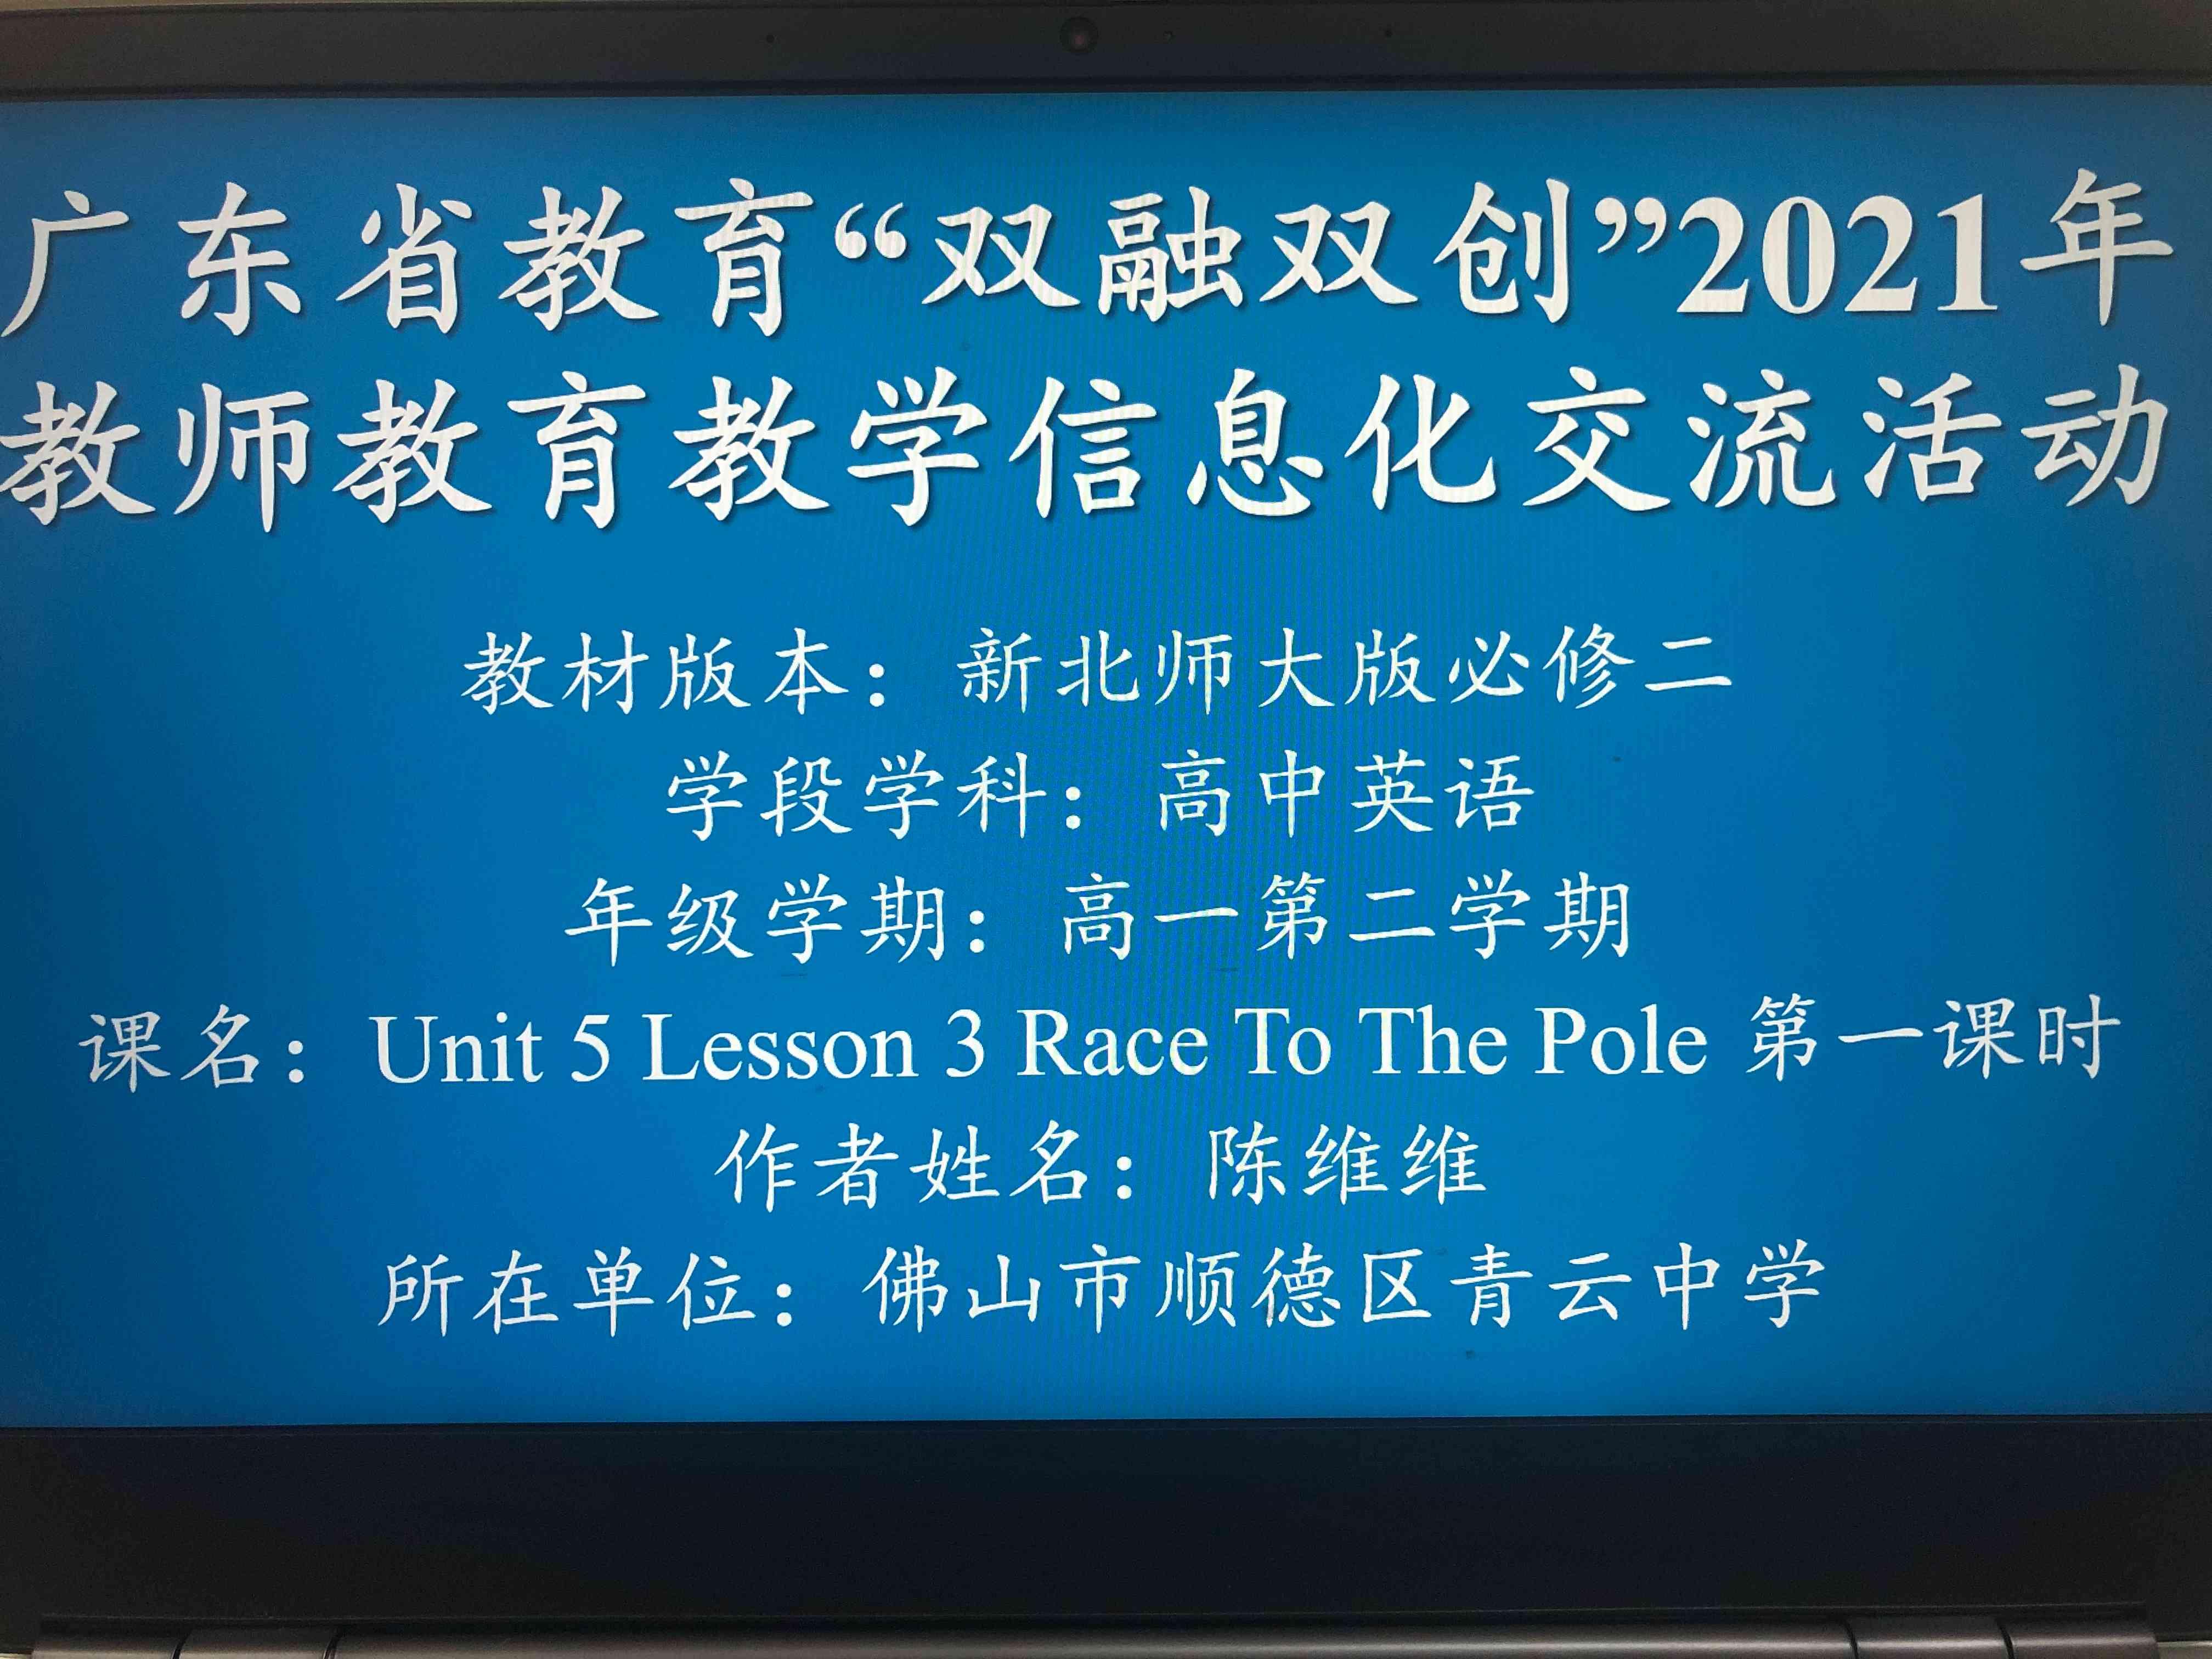 Unit 5 Lesson 3 Race To The Pole 第一课时